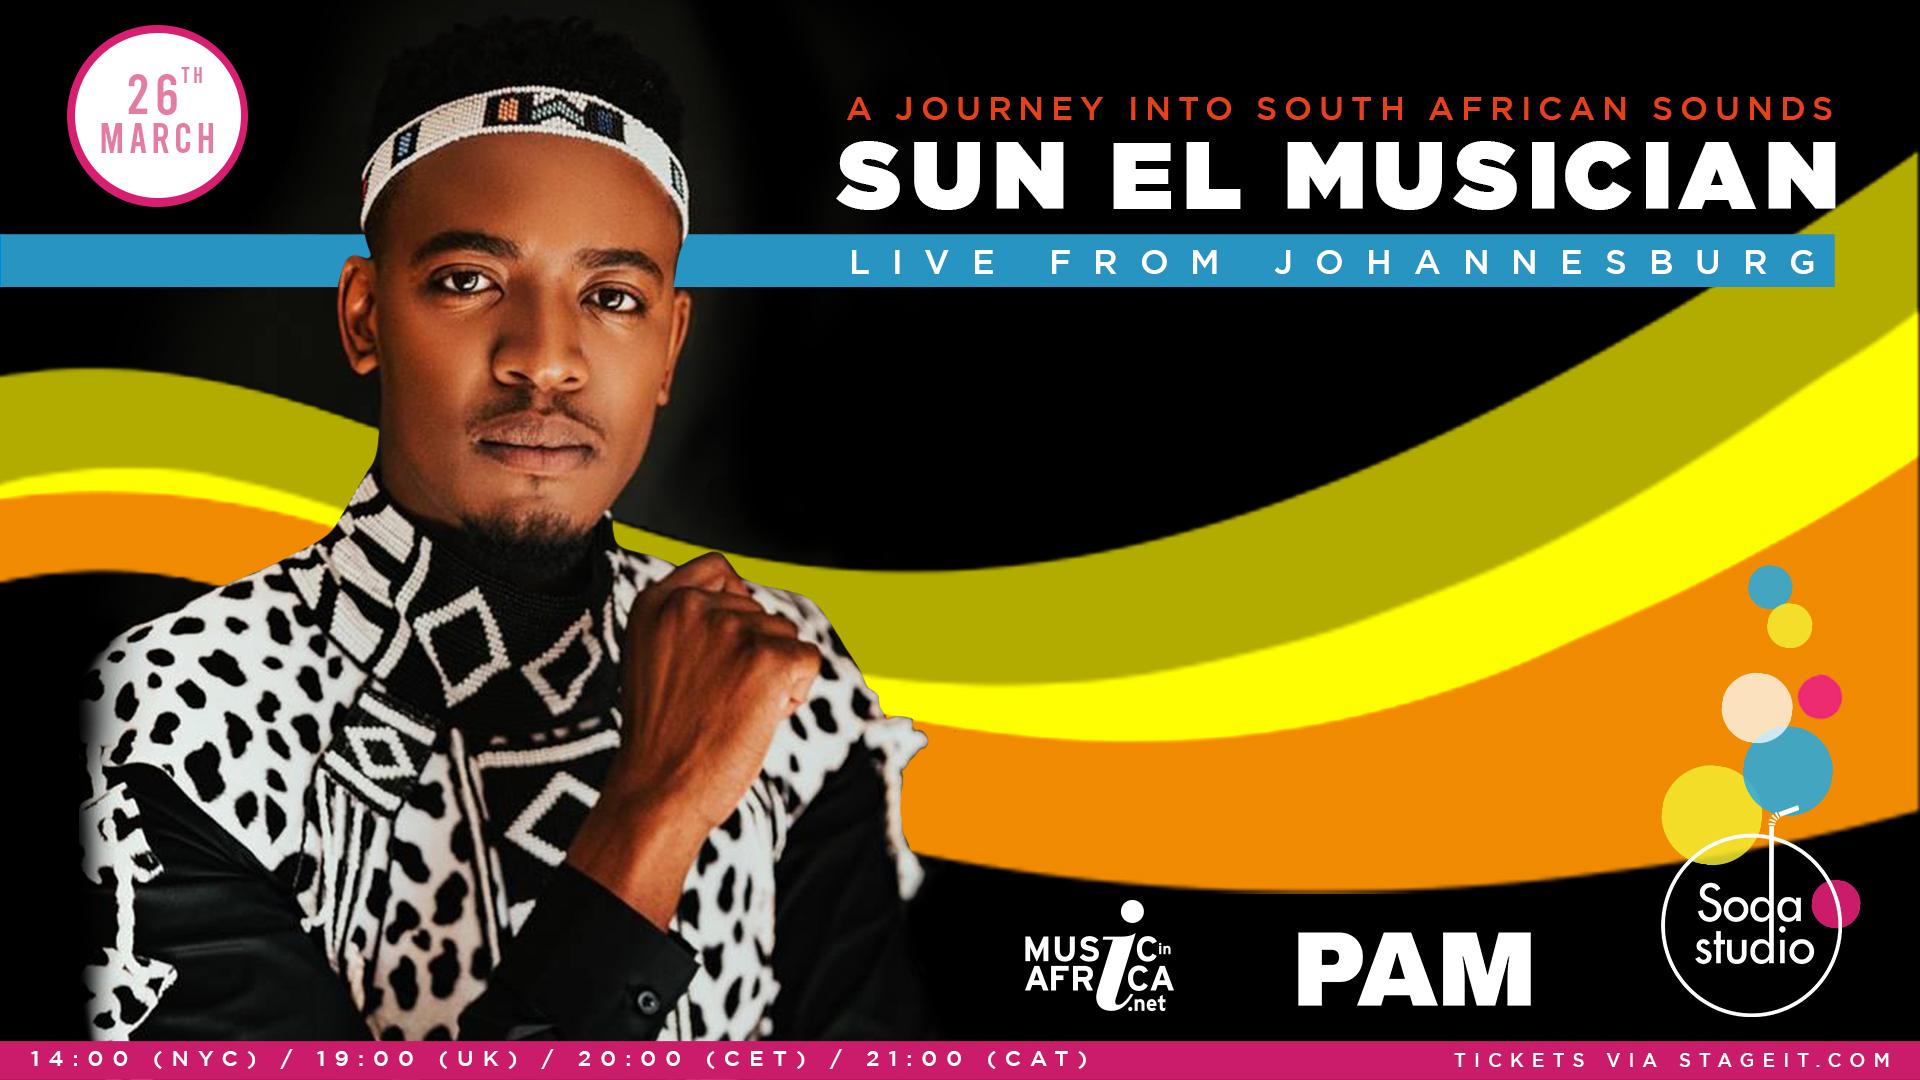 Sun El Musician